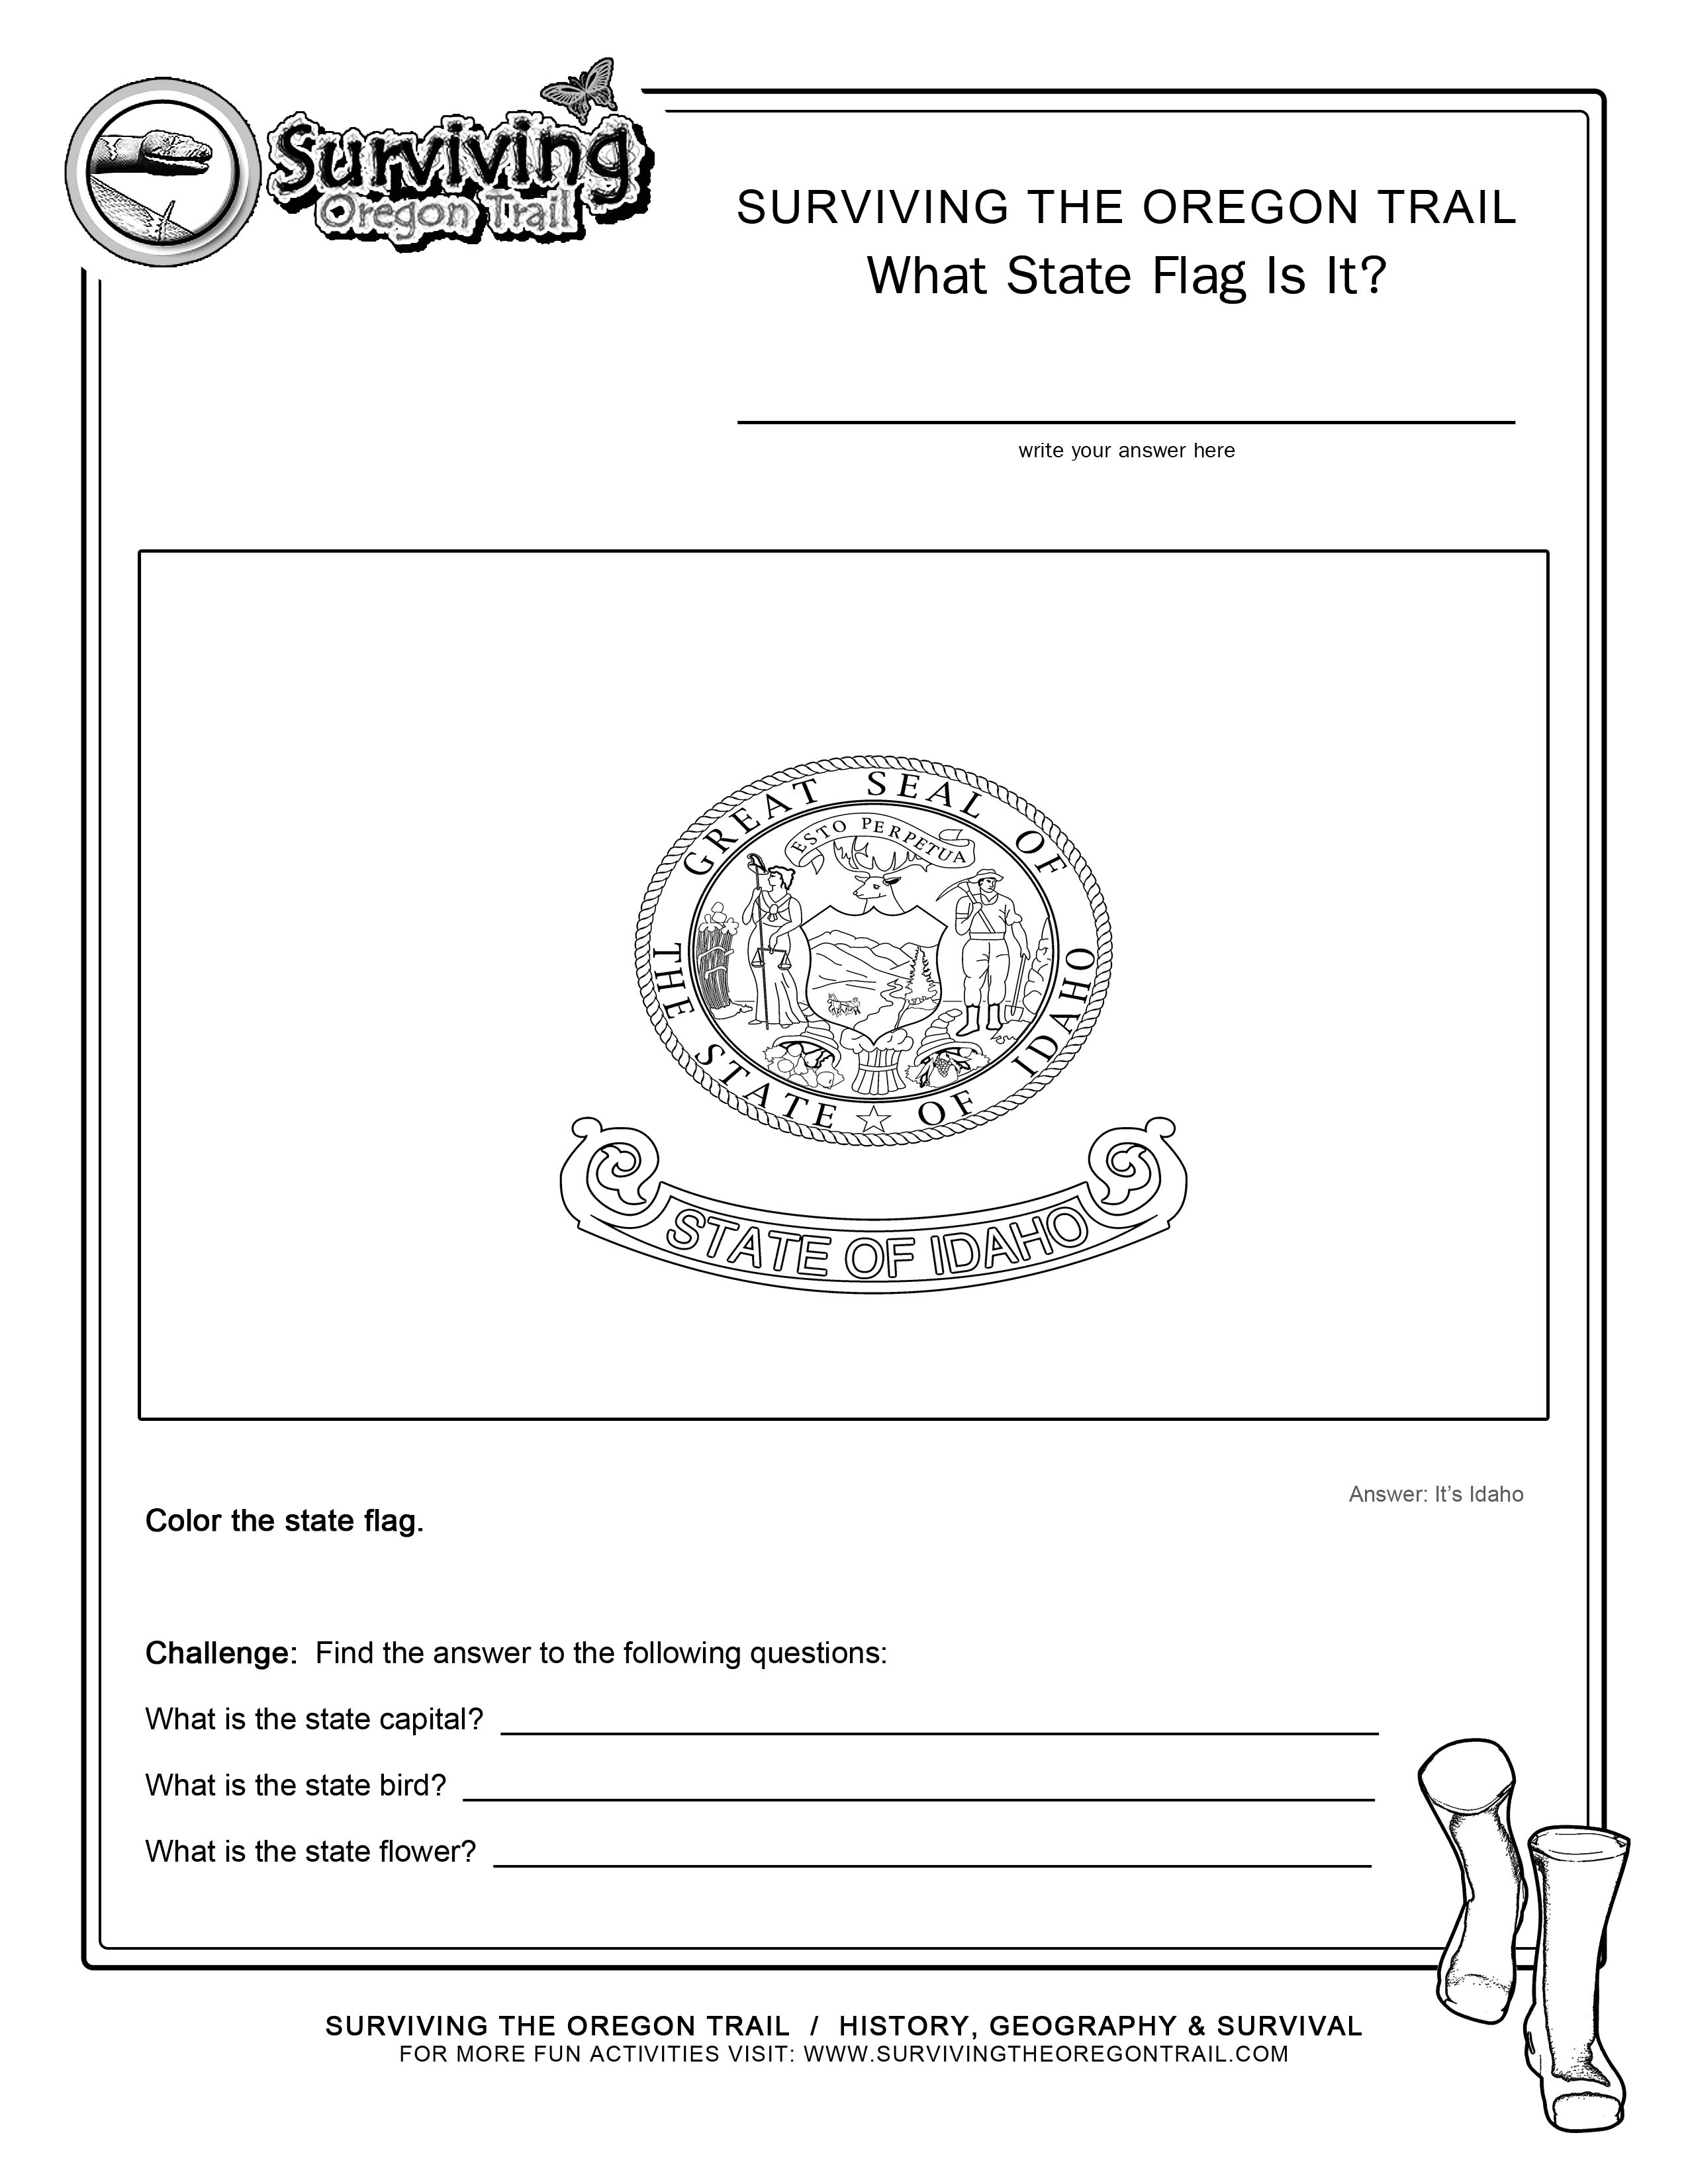 Coloring Page State Flag Idaho Printable Worksheet – Surviving The - Free Printable Arkansas History Worksheets